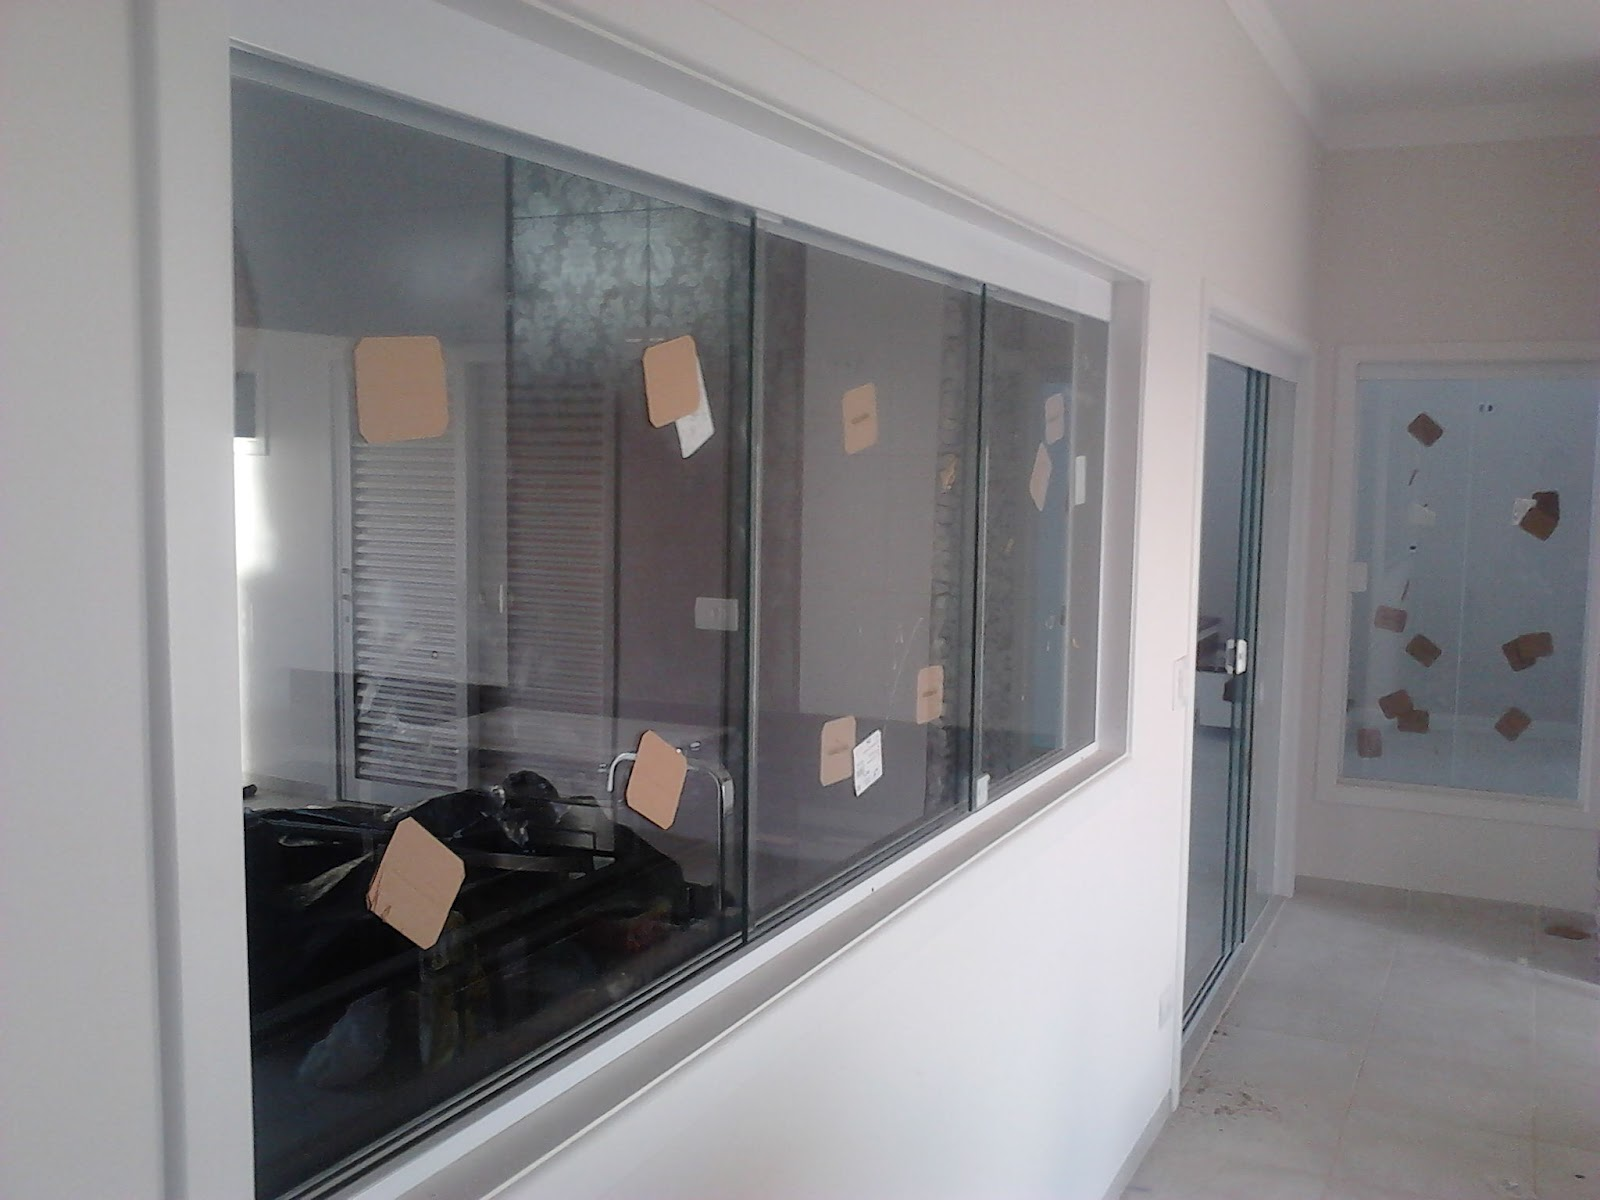 #515960 domingo 25 de novembro de 2012 1612 Vidros Para Portas E Janelas